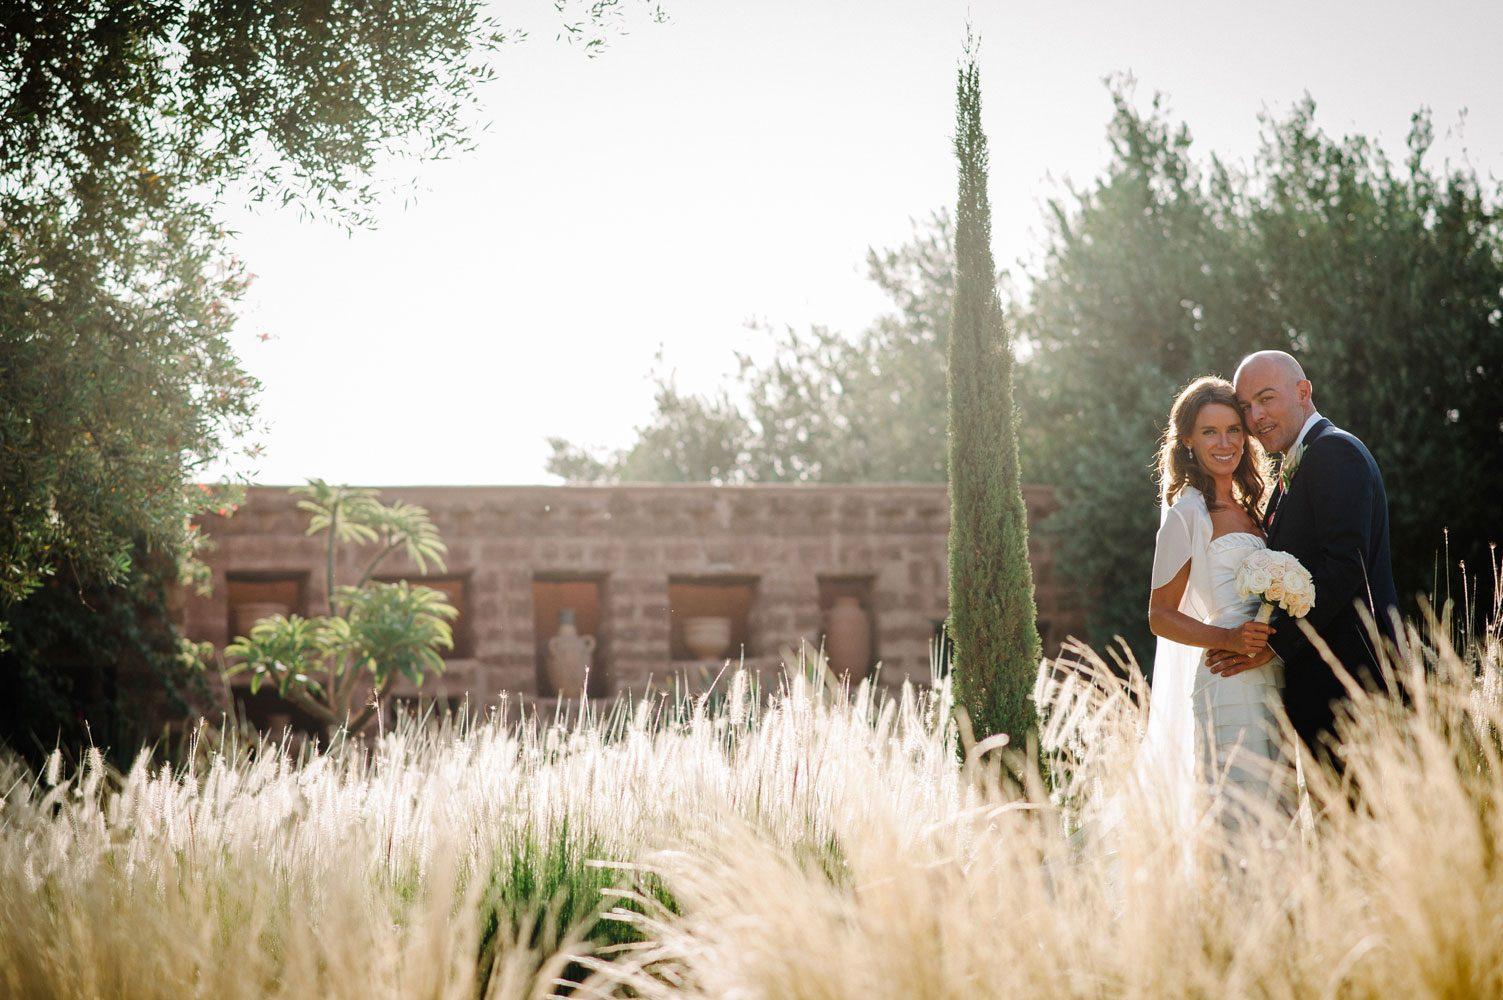 bride and groom in garden of beldi country club